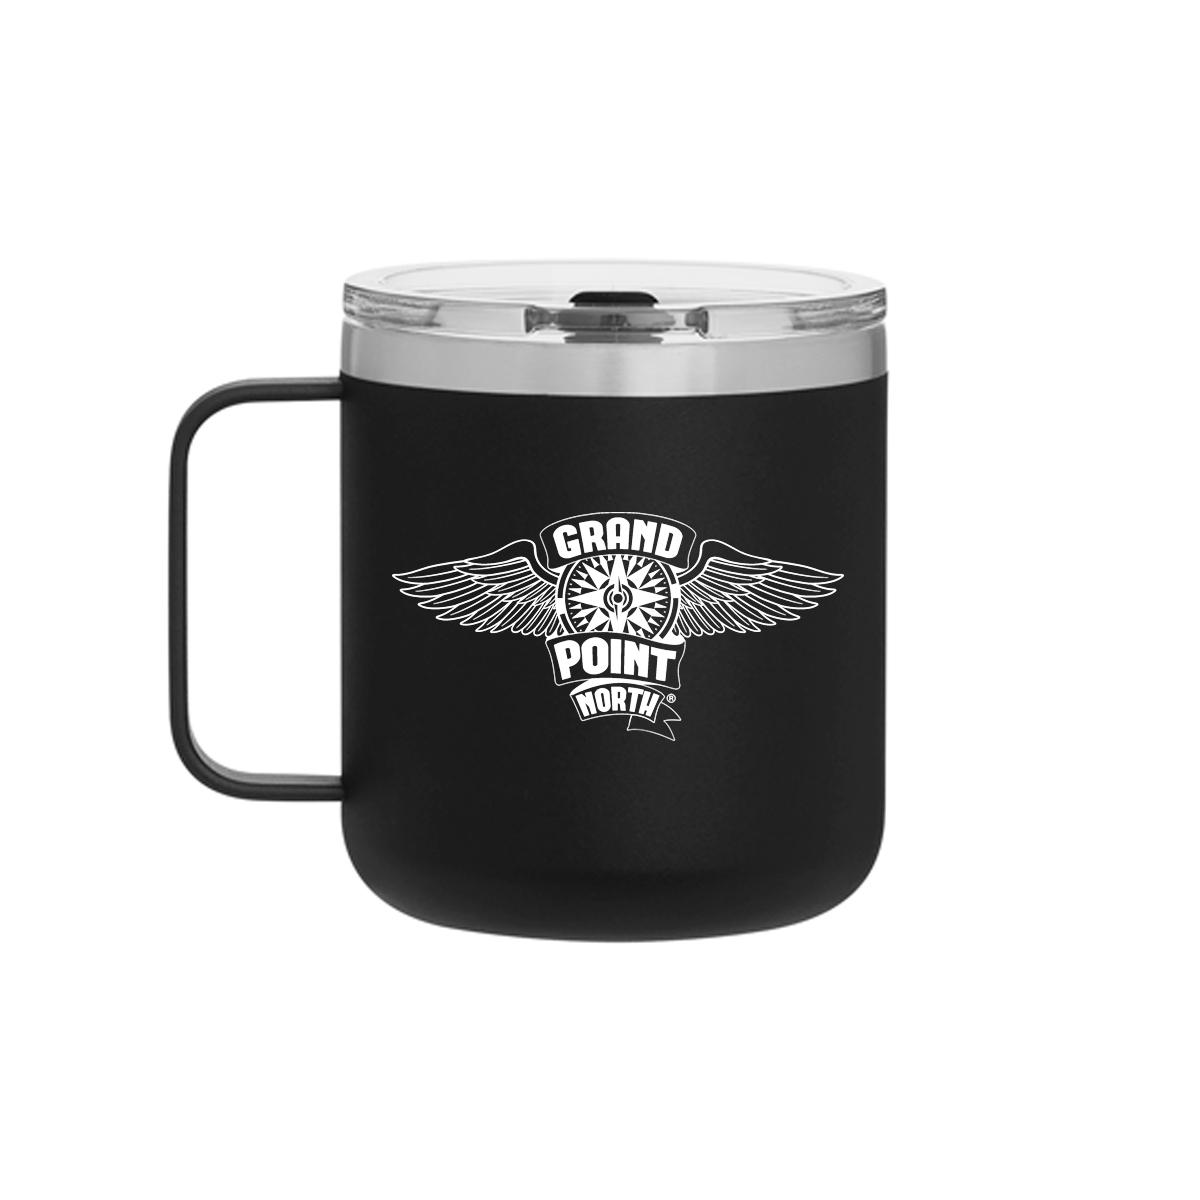 Grand Point North ® Insulated Mug